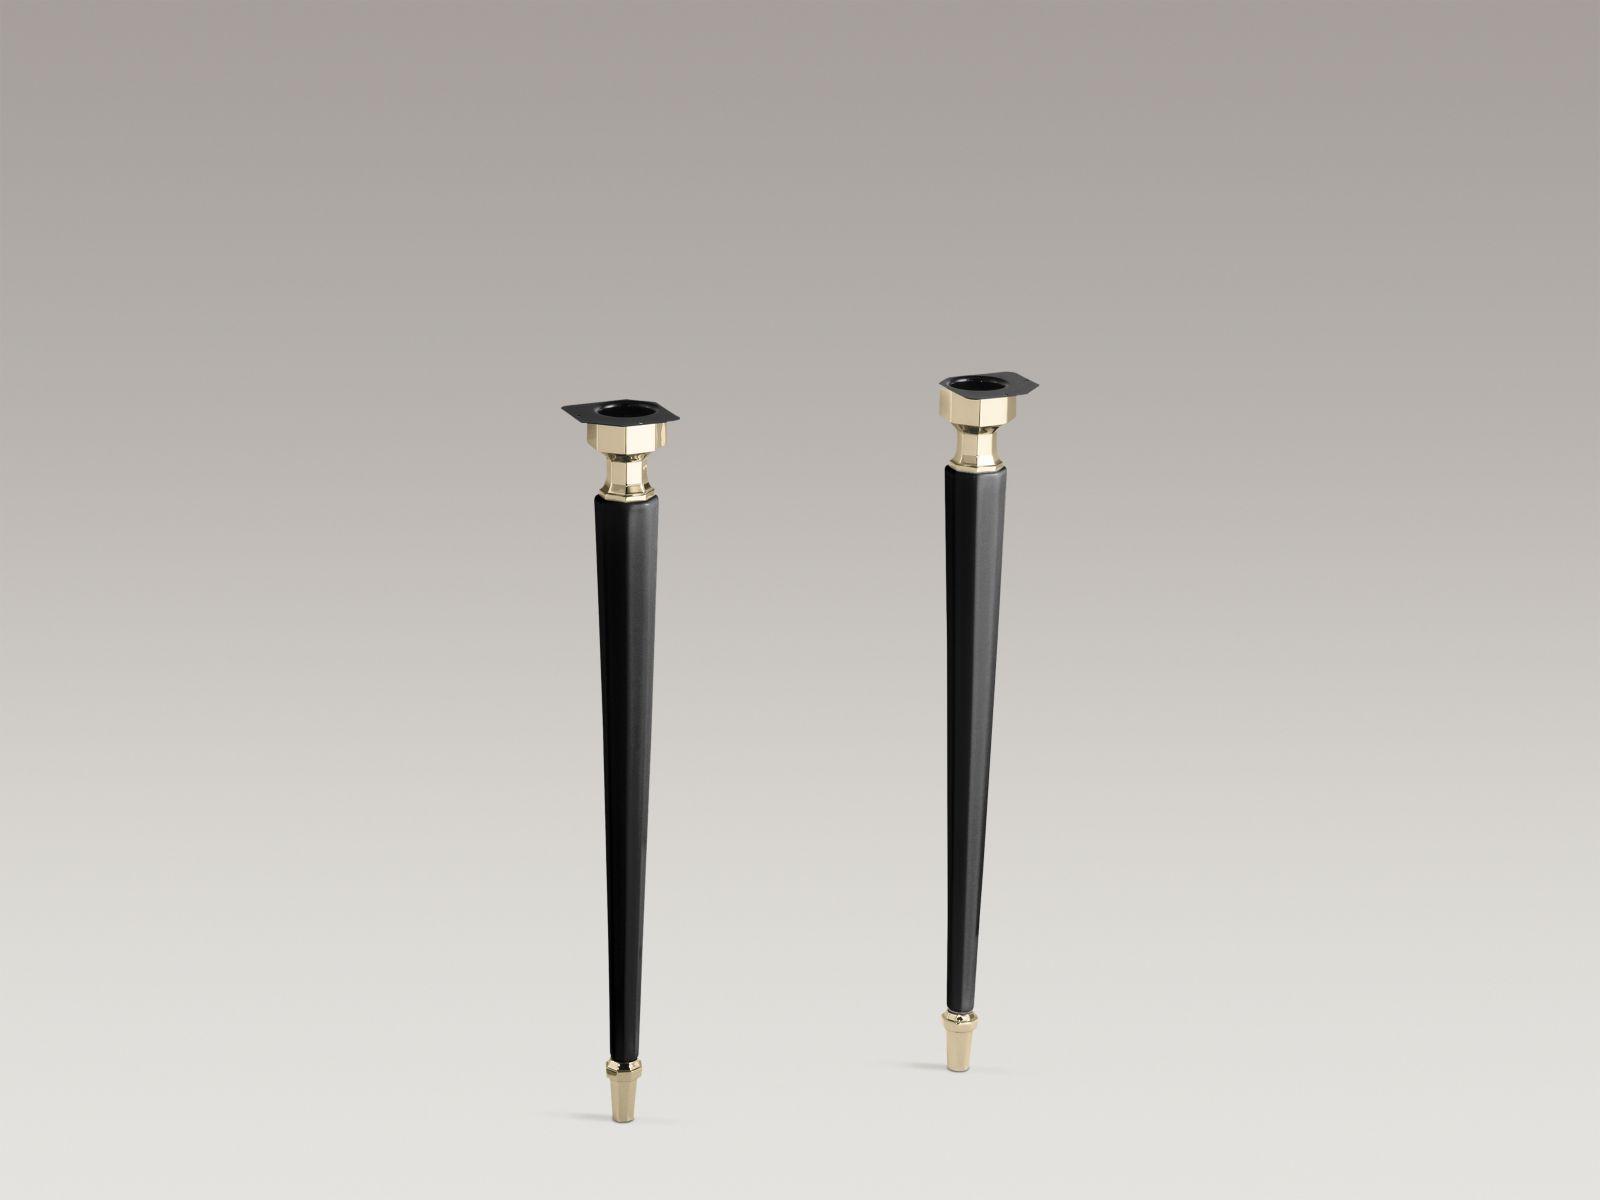 Kohler K-2317-AF-7 Kathryn Octagonal Fireclay Legs with Vibrant French Gold Trim Black Black